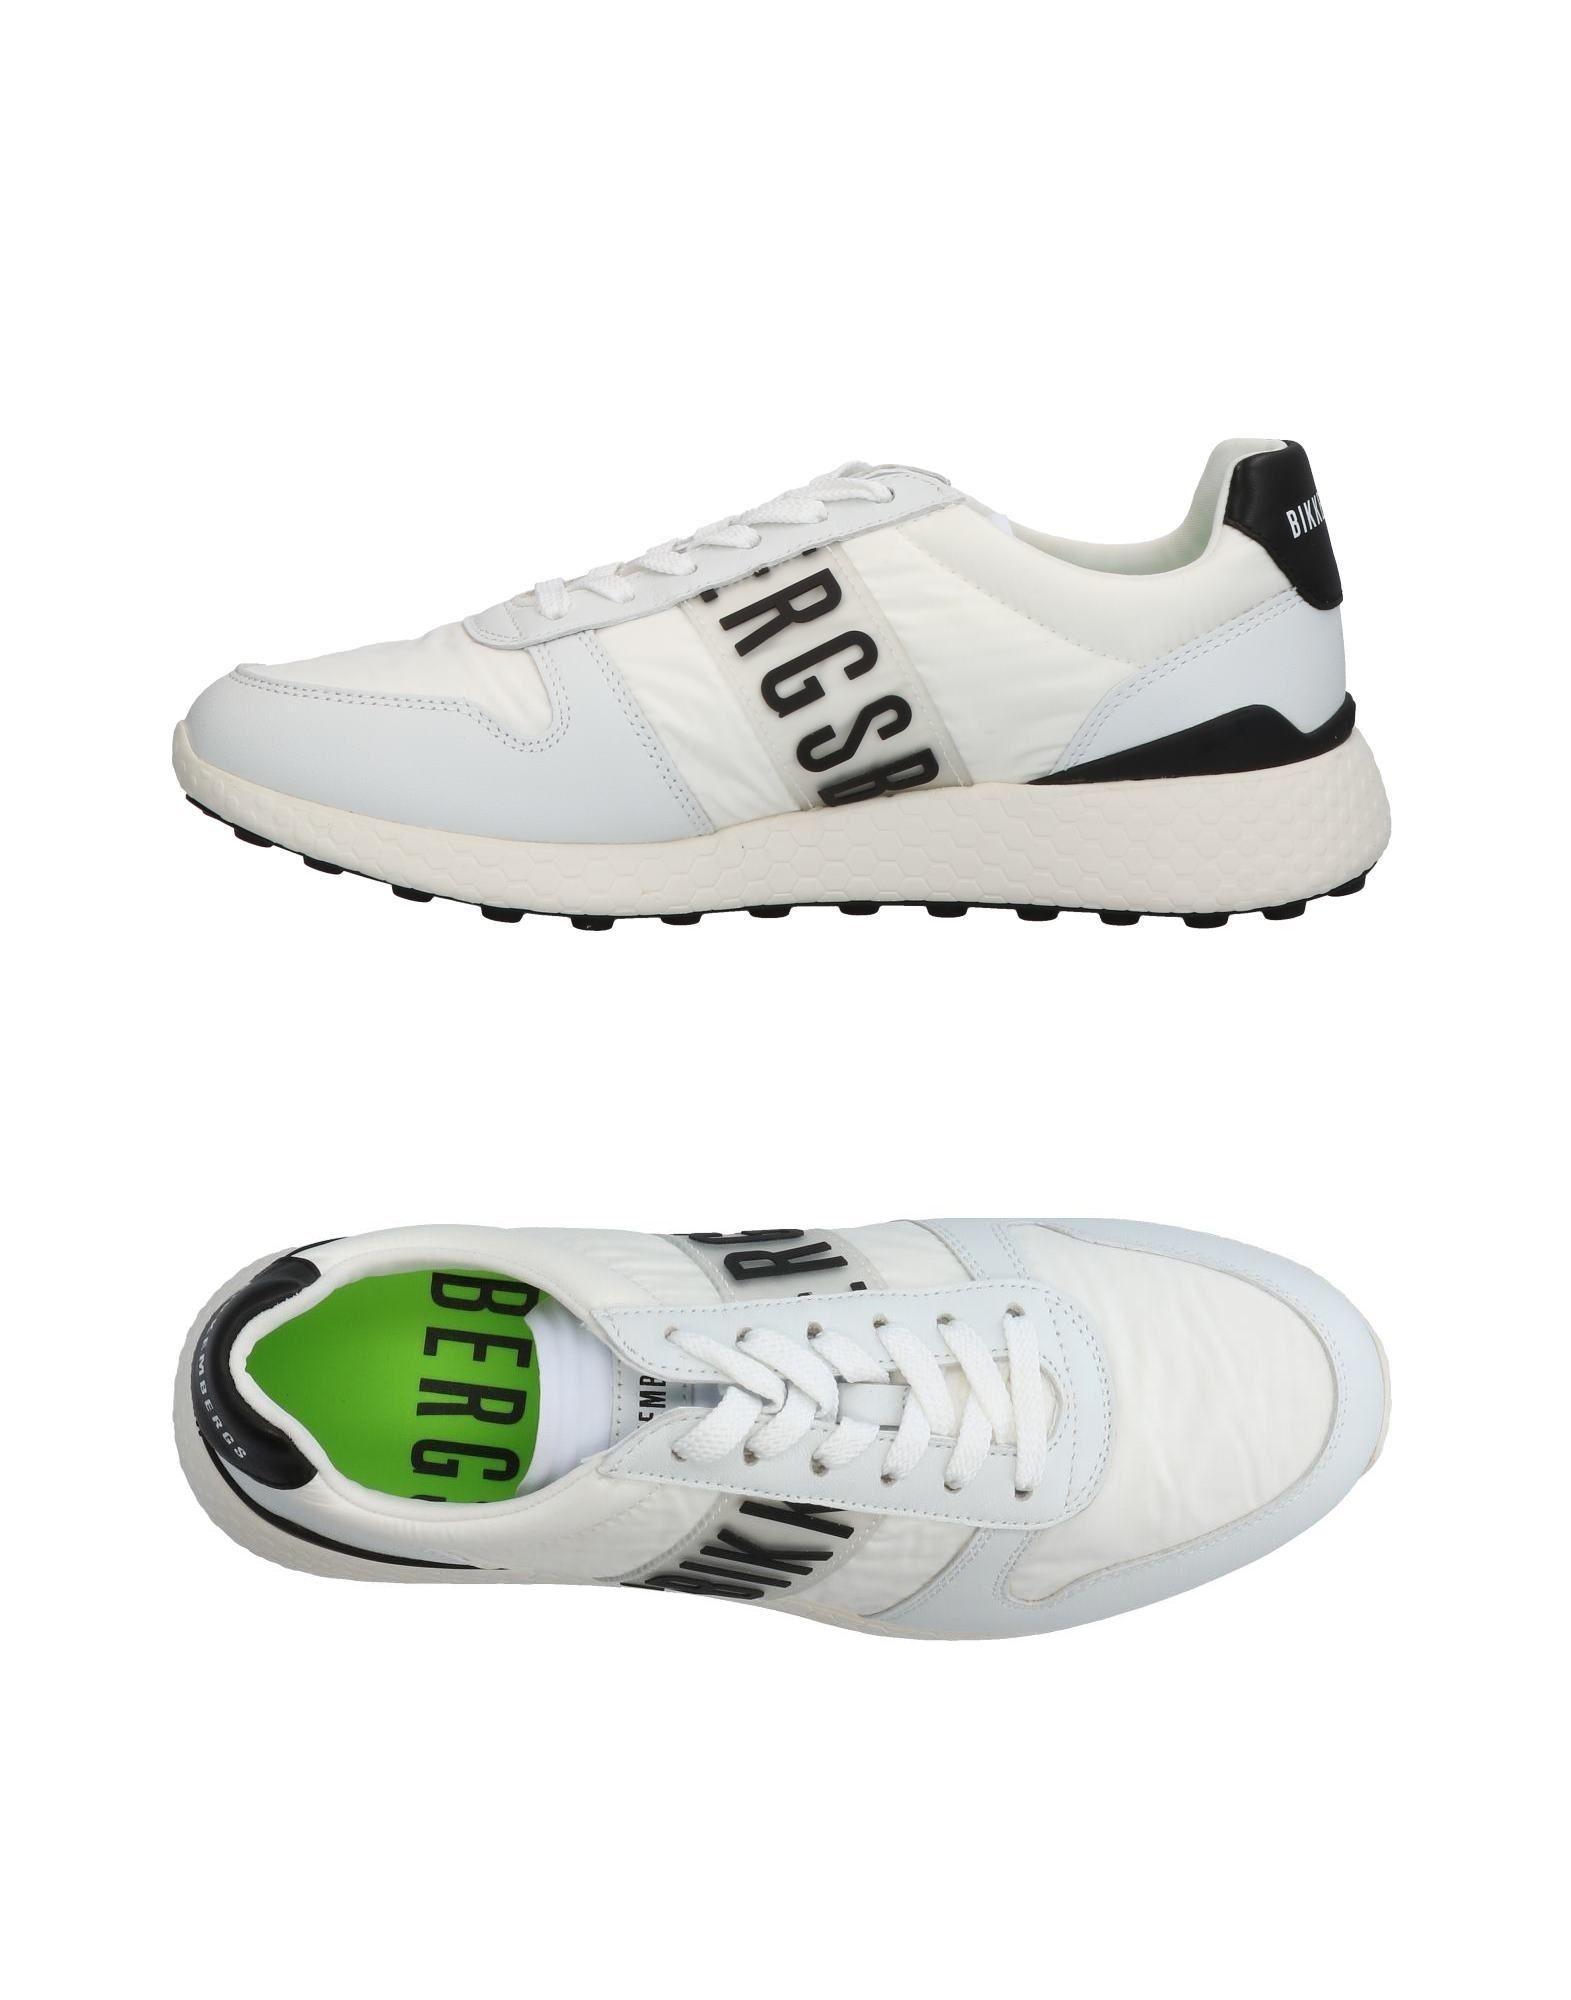 A buon mercato Sneakers Bikkembergs Uomo - 11326241GK